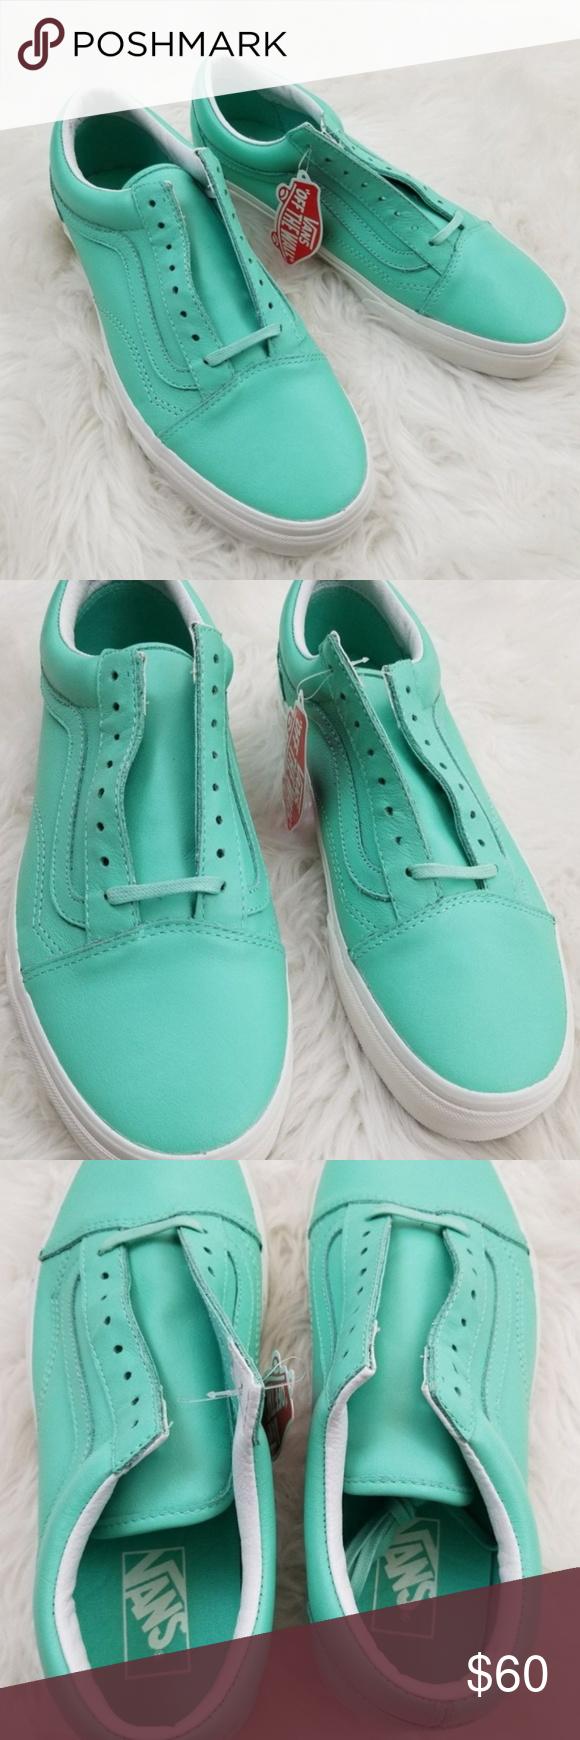 ac10b3f4c9 VANS Old Skool Pastel Green Leather Shoes W 10 Brand new in box. Vans Old